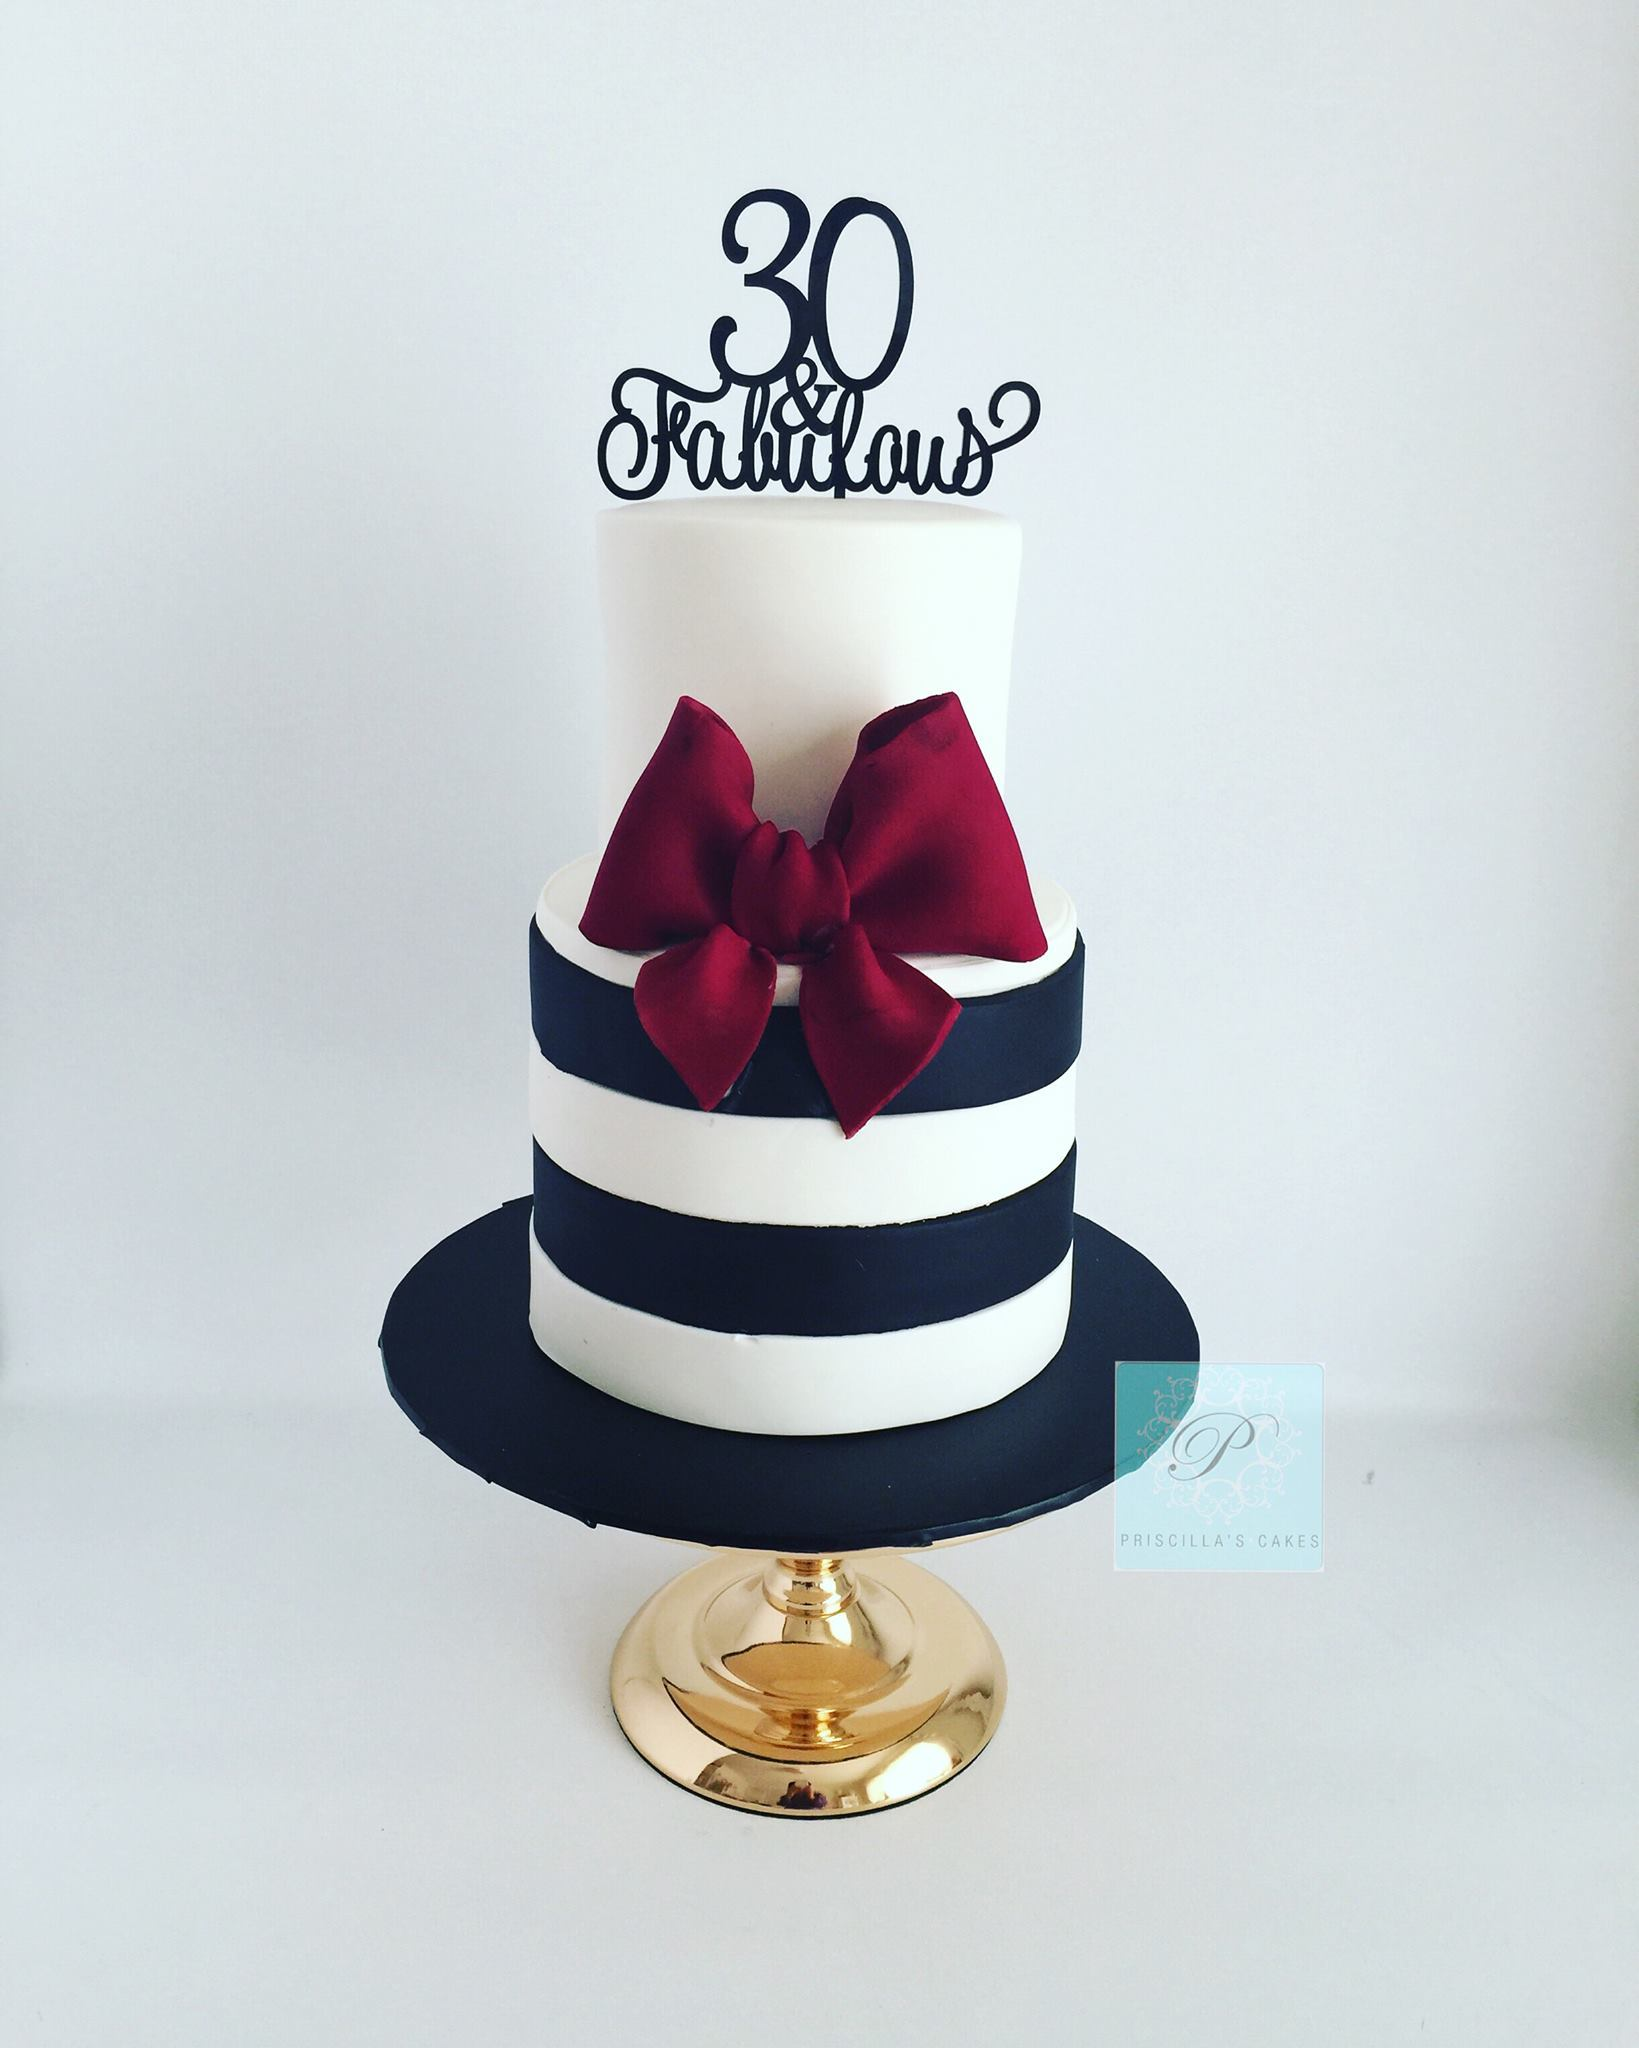 Black & White Striped Birthday Cake